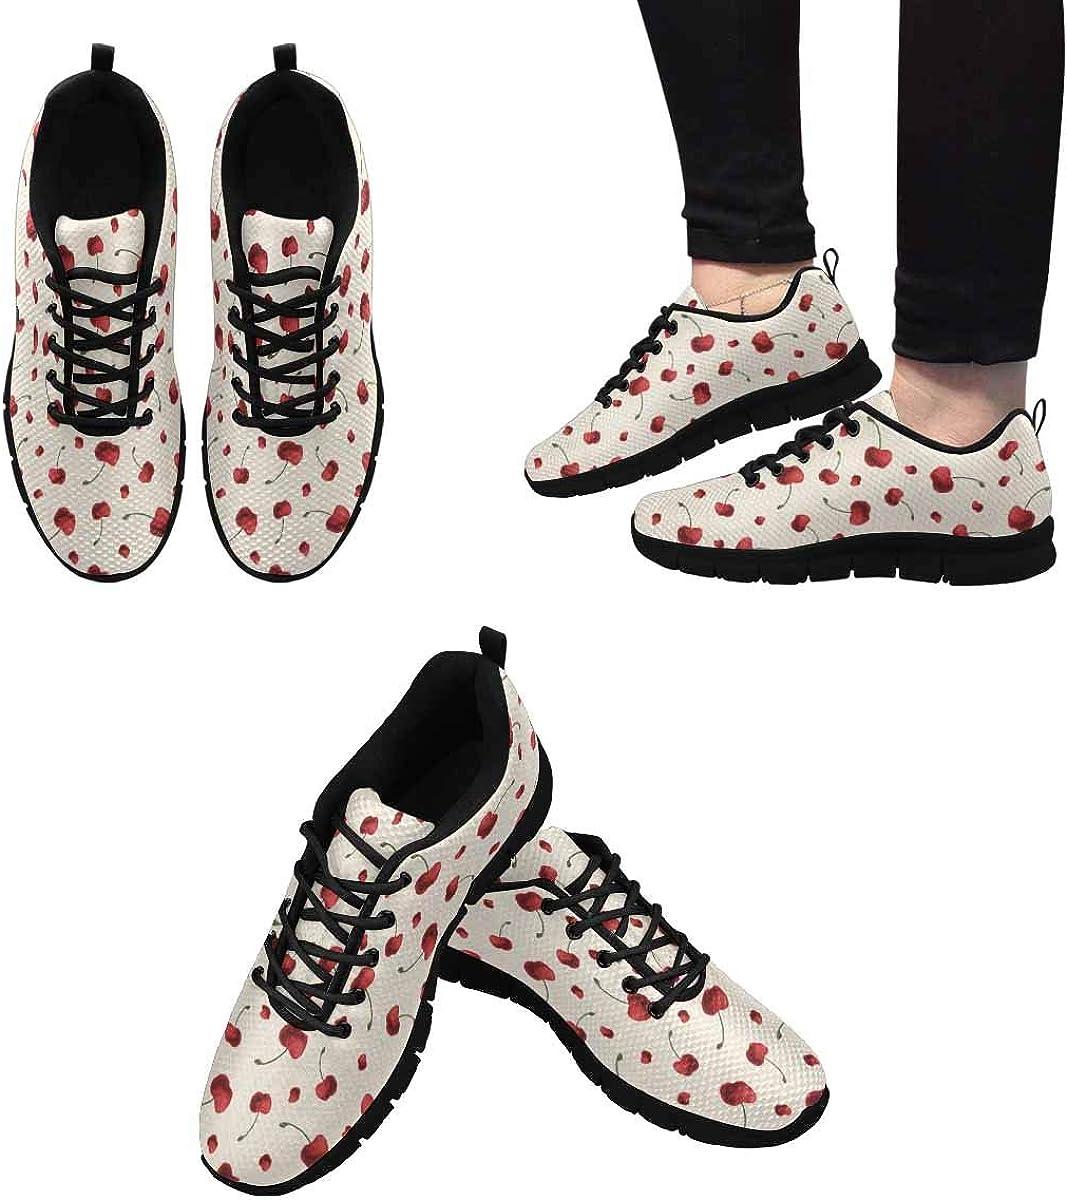 InterestPrint Sweet Cherries Women's Breathable Comfort Mesh Fashion Sneakers